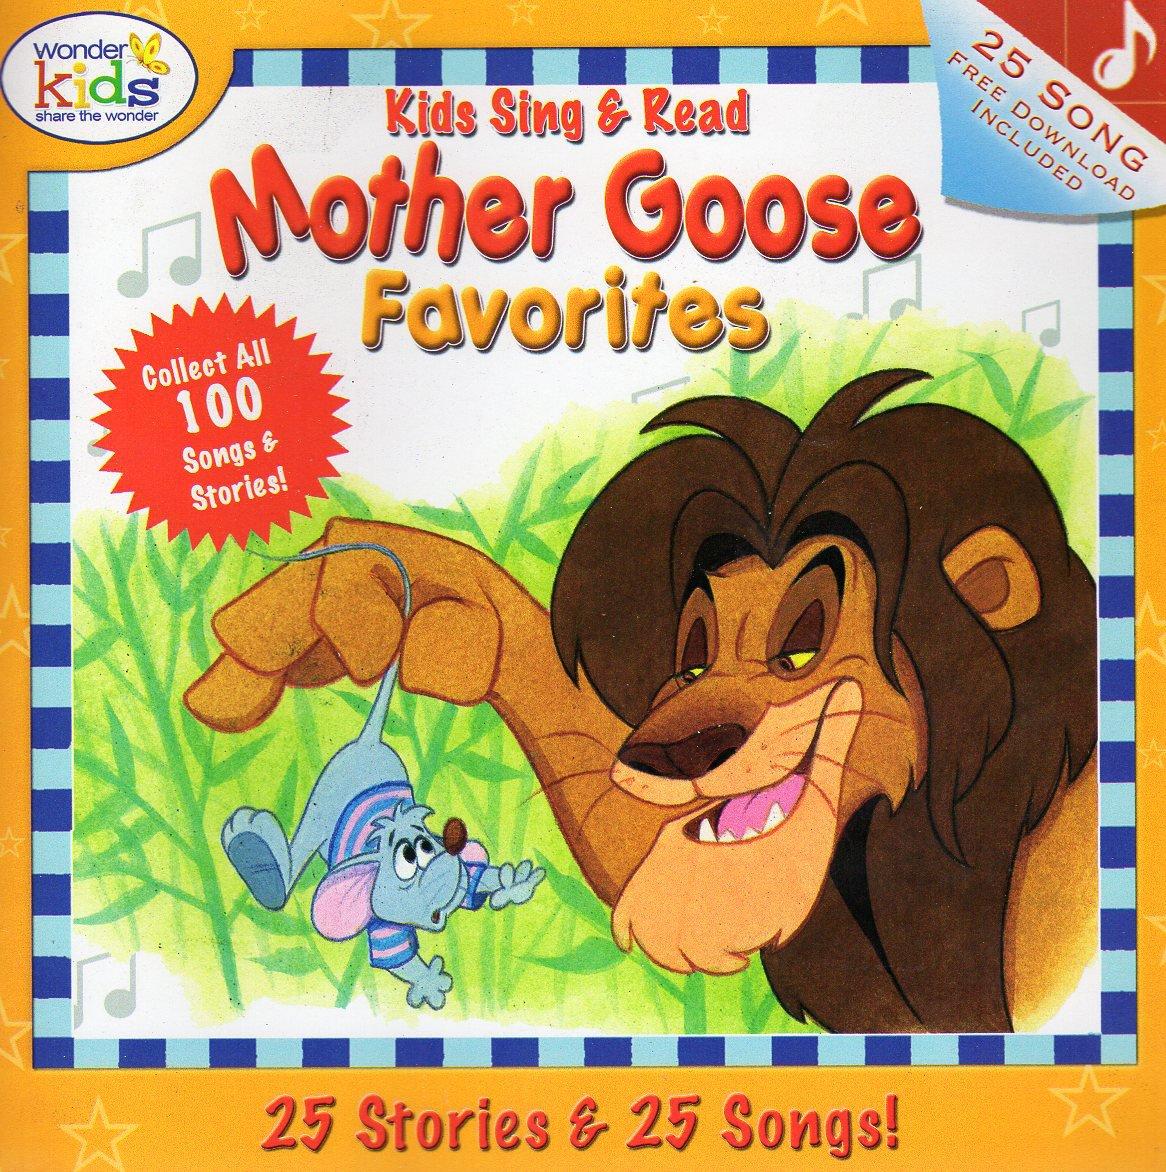 Kids Sing & Read Mother Goose Favorites 25 Stories & 25 Songs! - v1